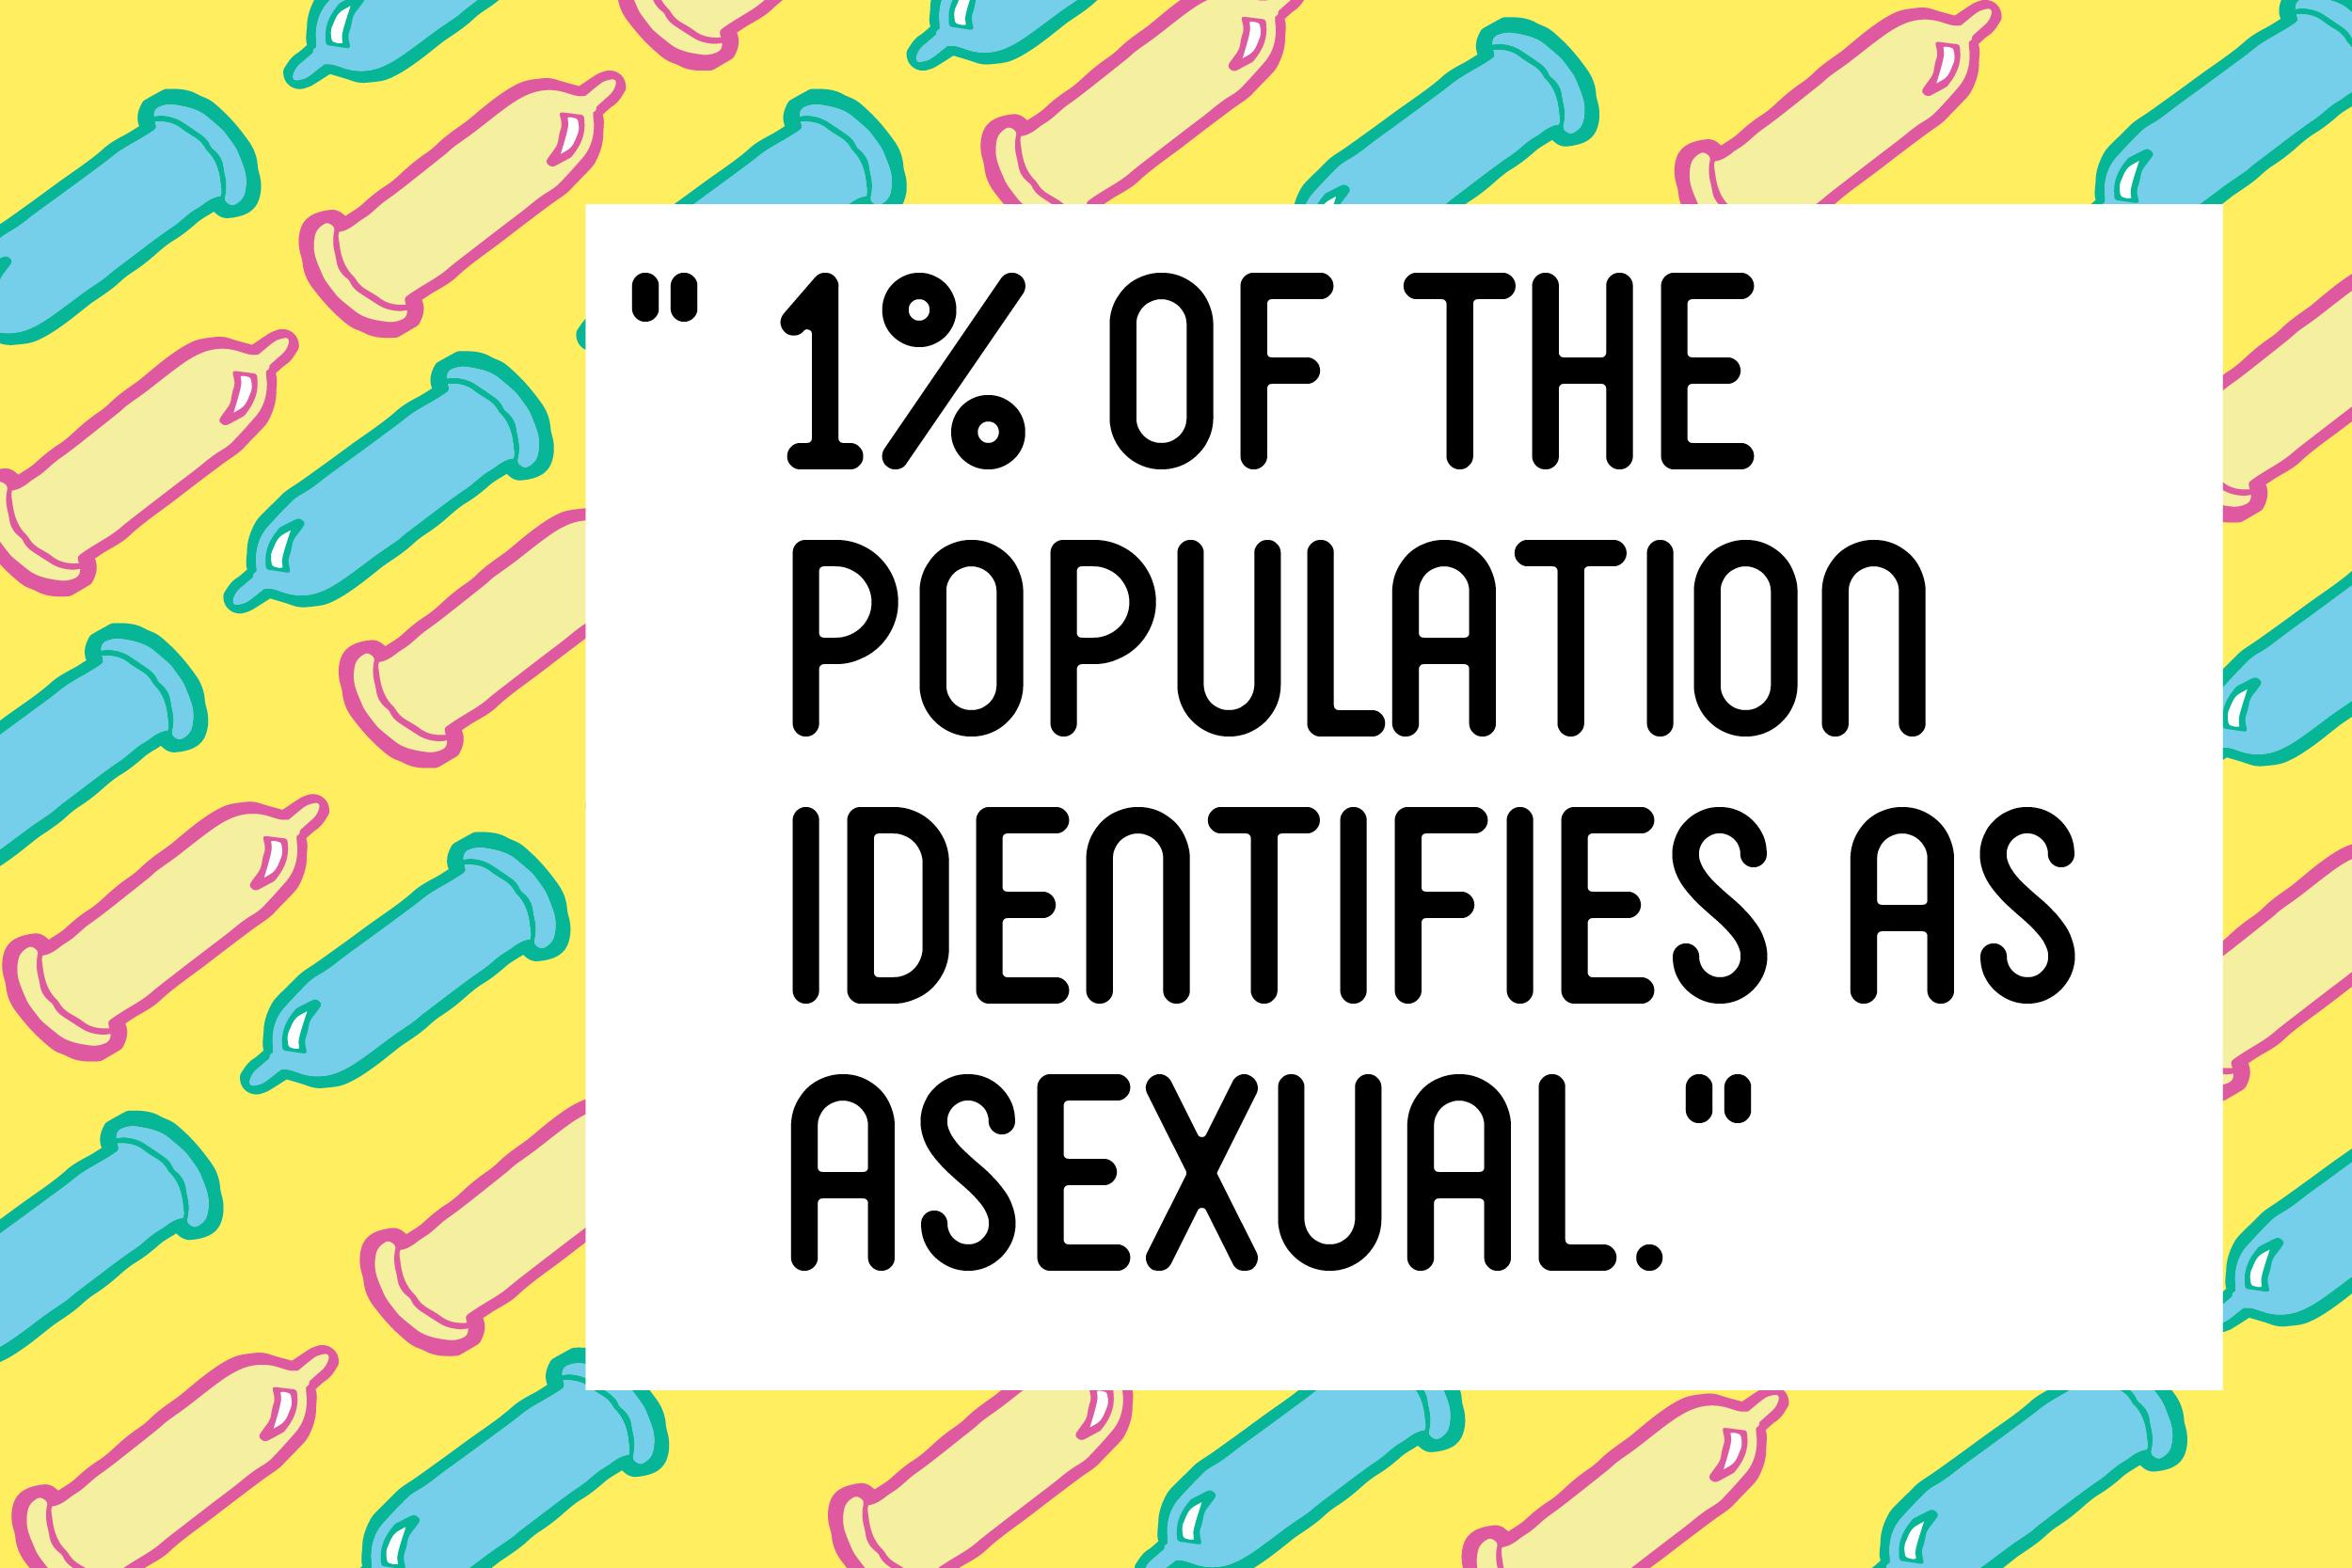 AsexualQuotes_3